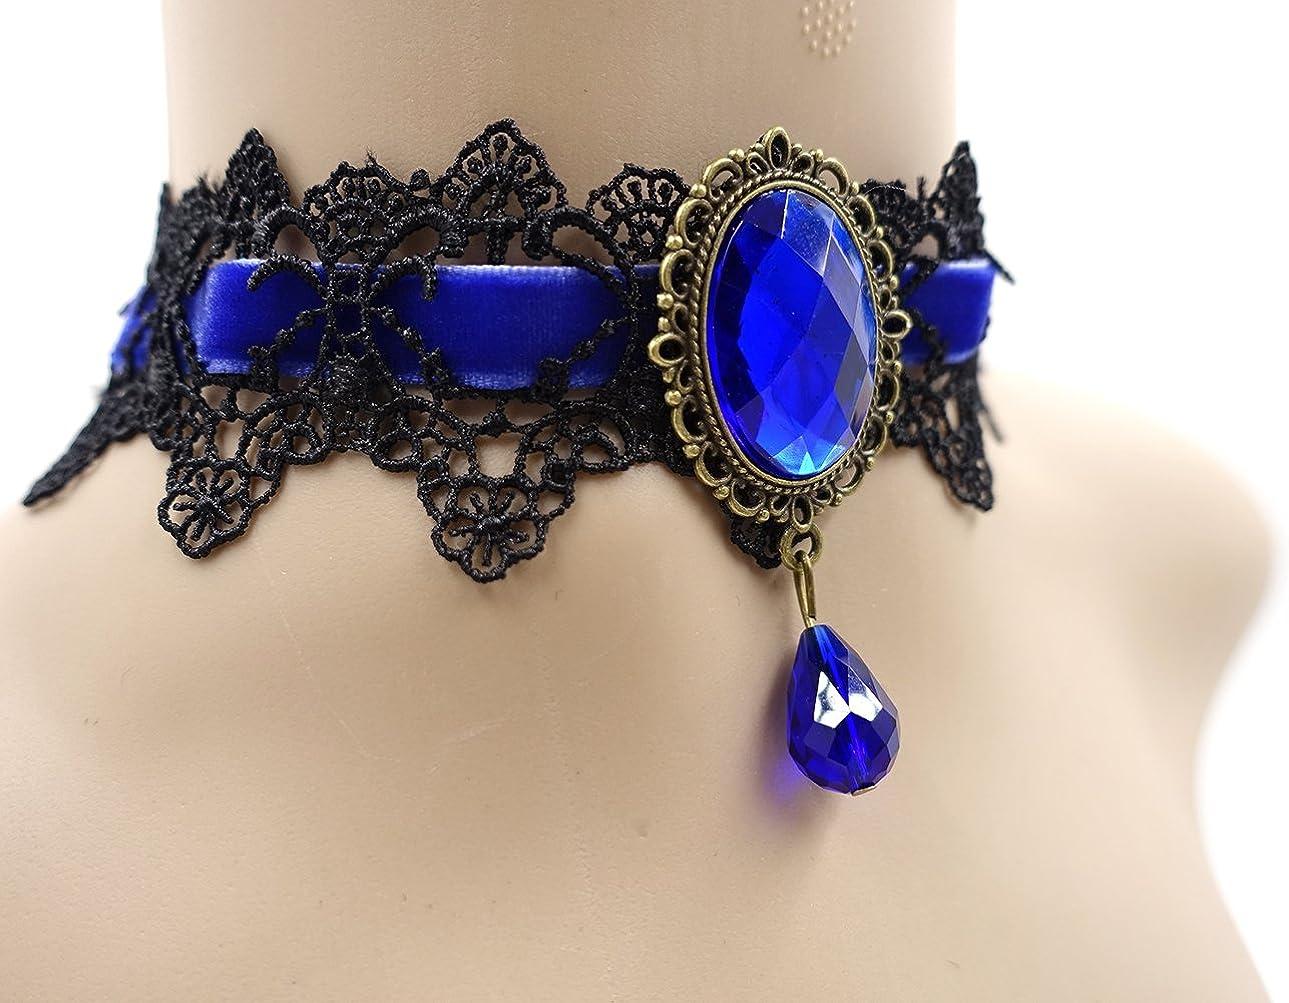 Retro Handmade Craft Lace Royal Court Vampire Choker Gothic Necklace Bracelet Black Pendant Chain Eternity J